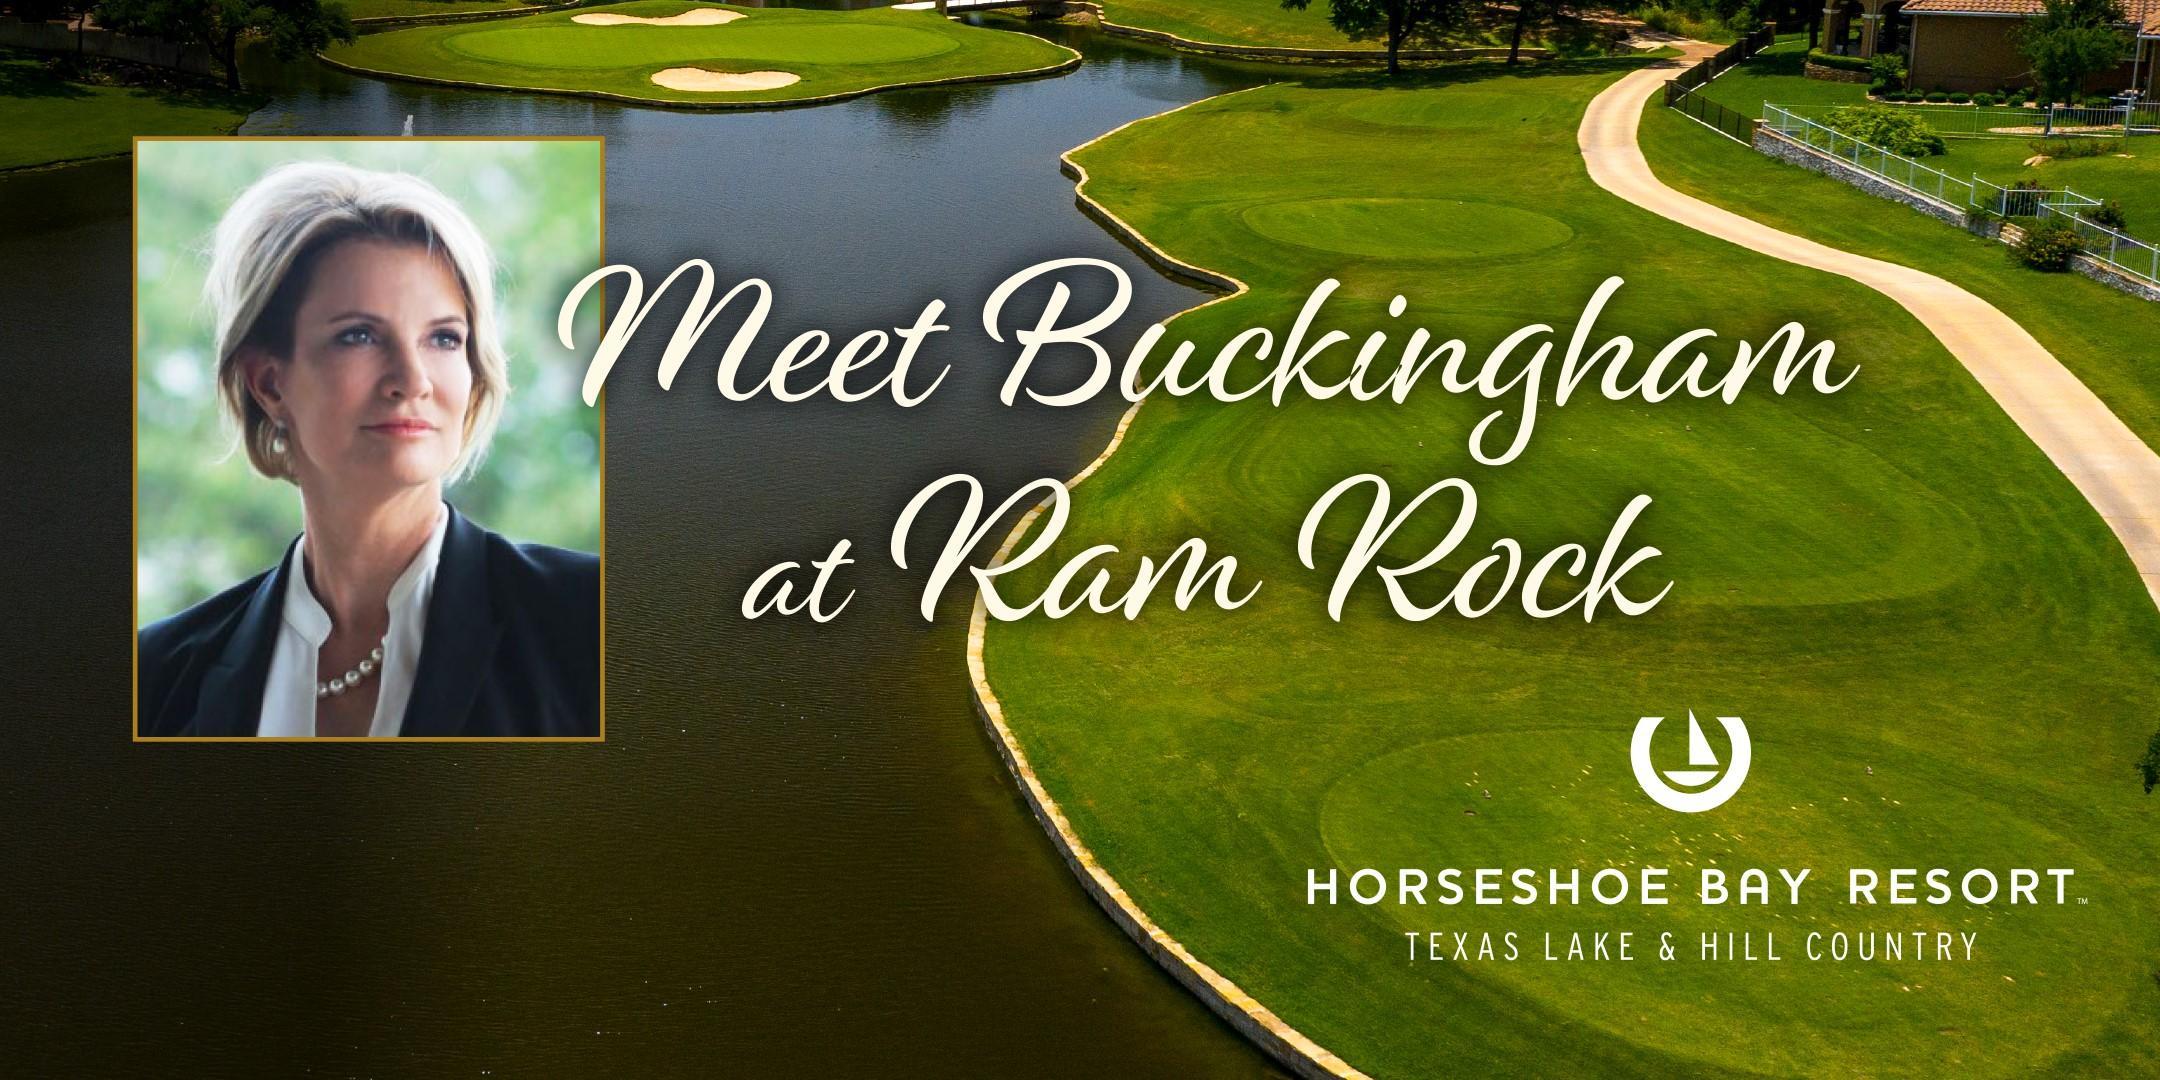 Buckingham Golf Tournament at Ram Rock - Horseshoe Bay Resort